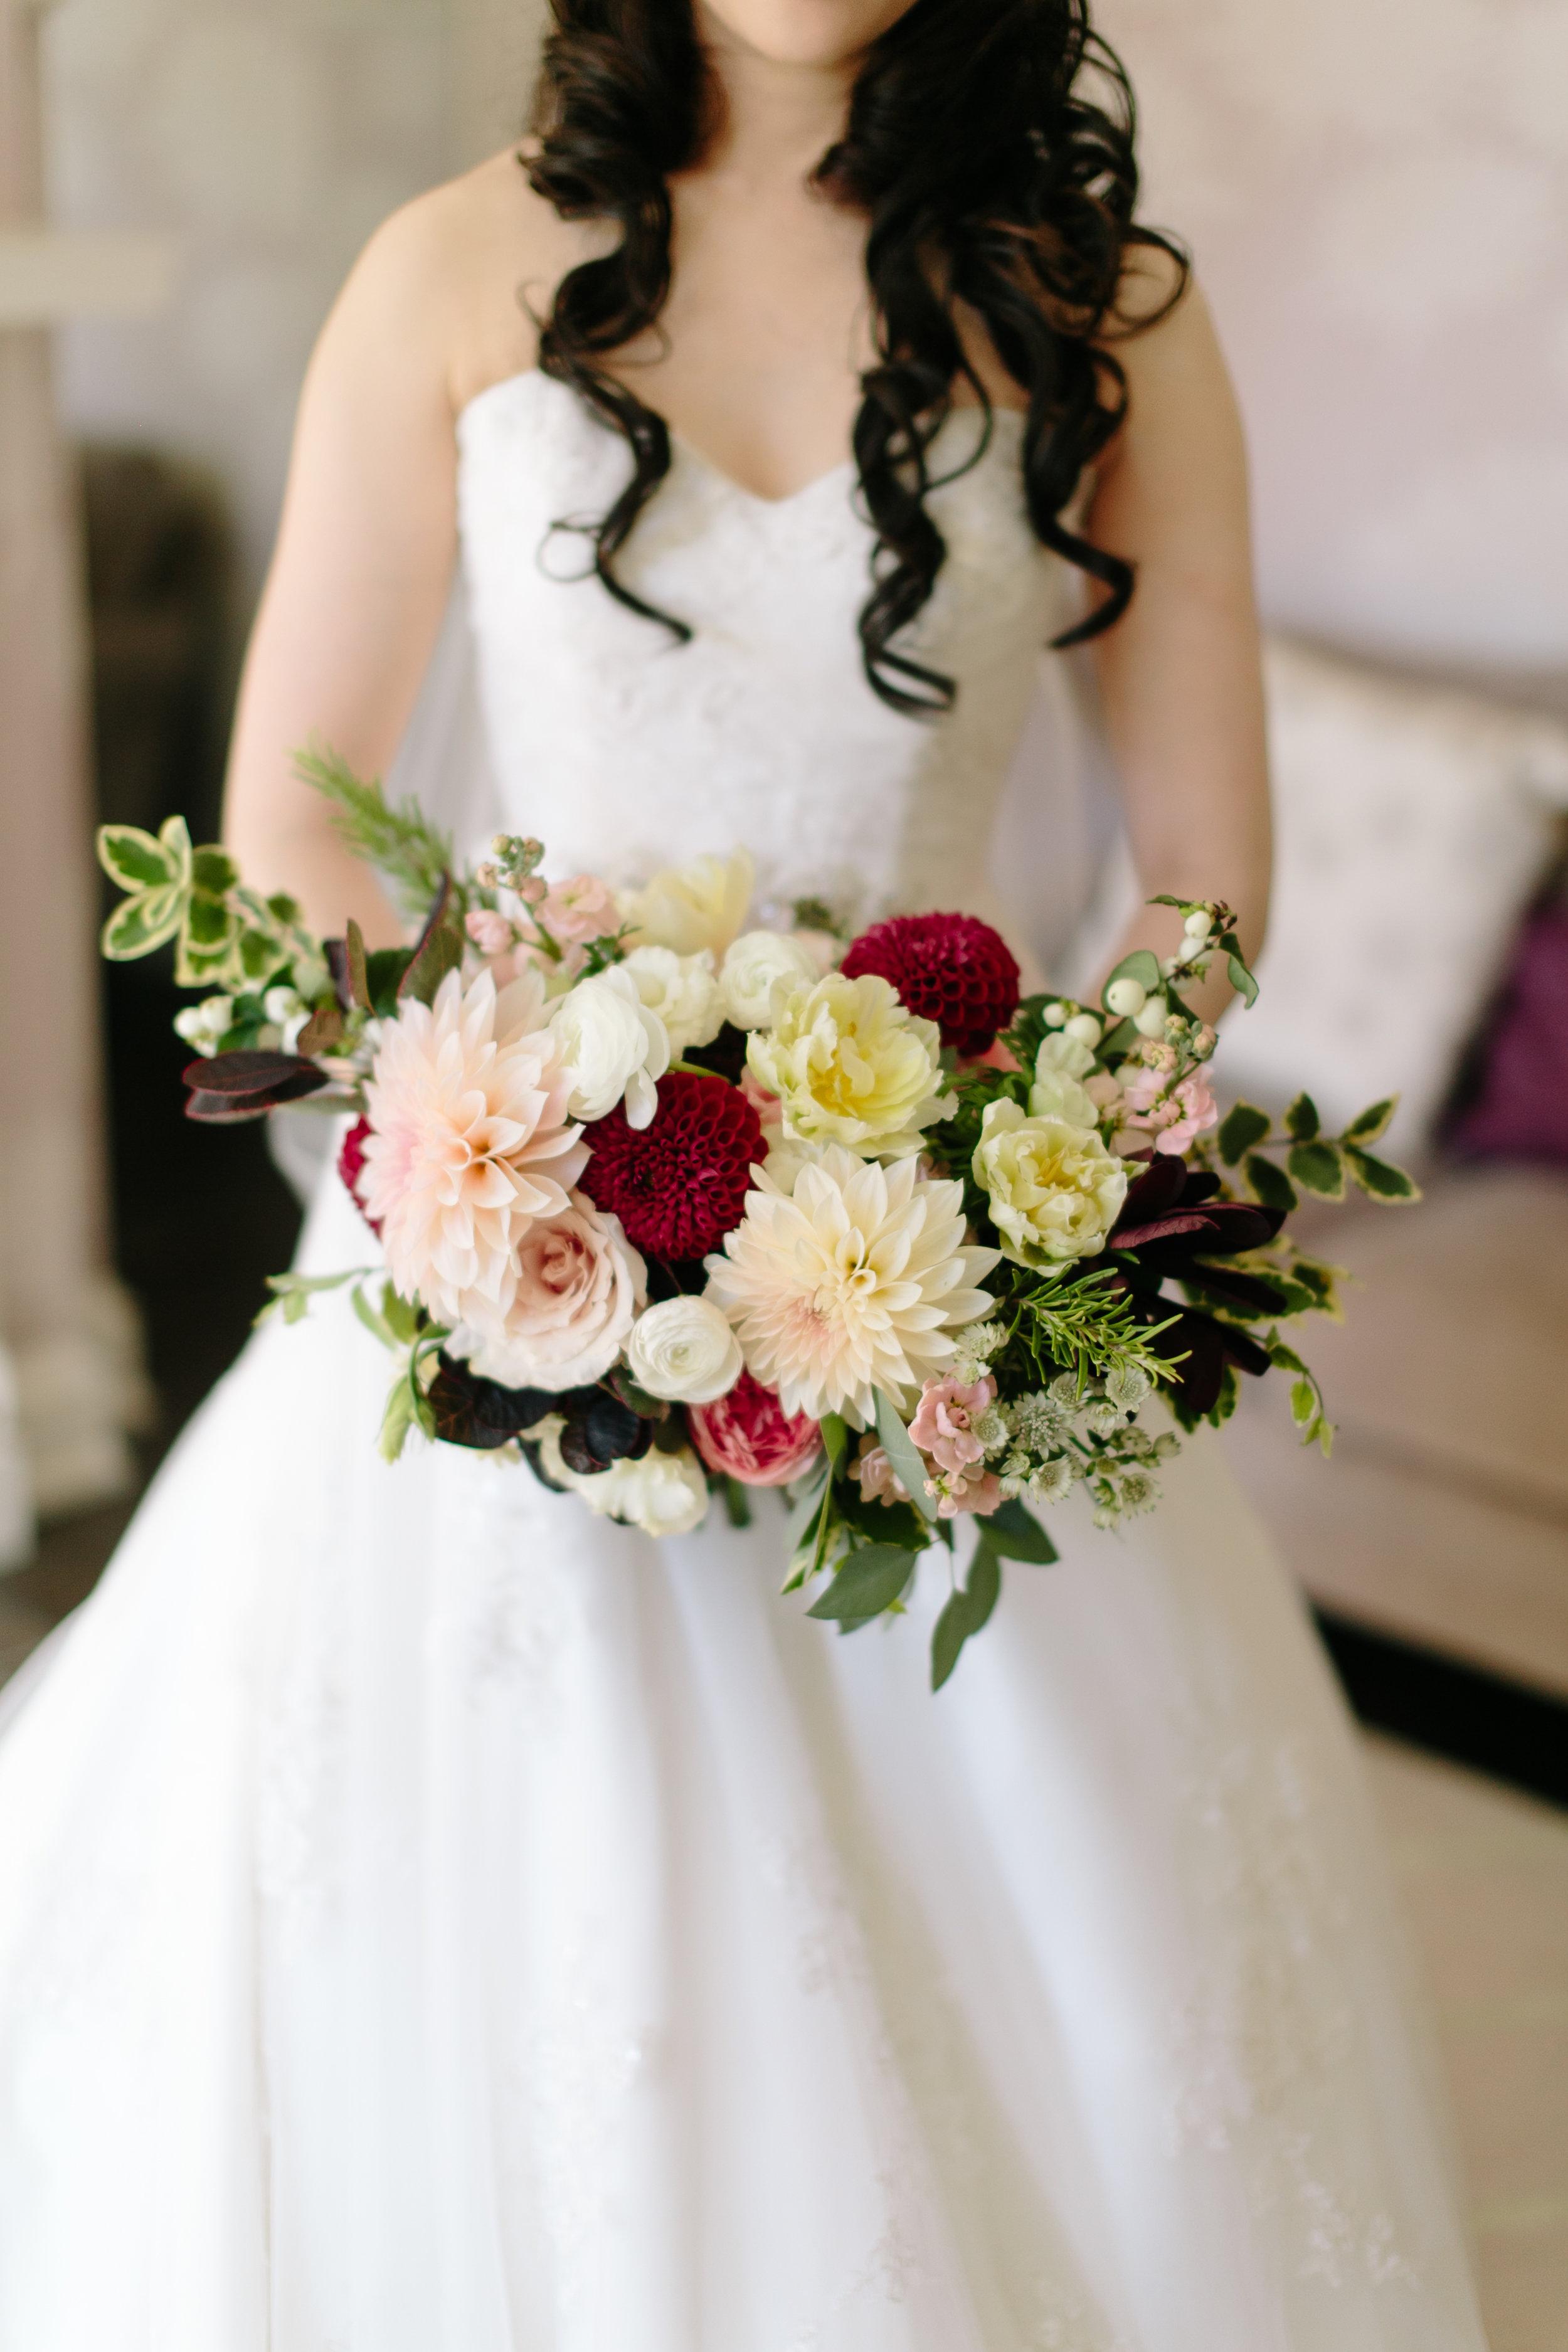 Phoebe Lo Events Toronto Wedding - Estates of Sunnybrook Rustic Event 005.jpg